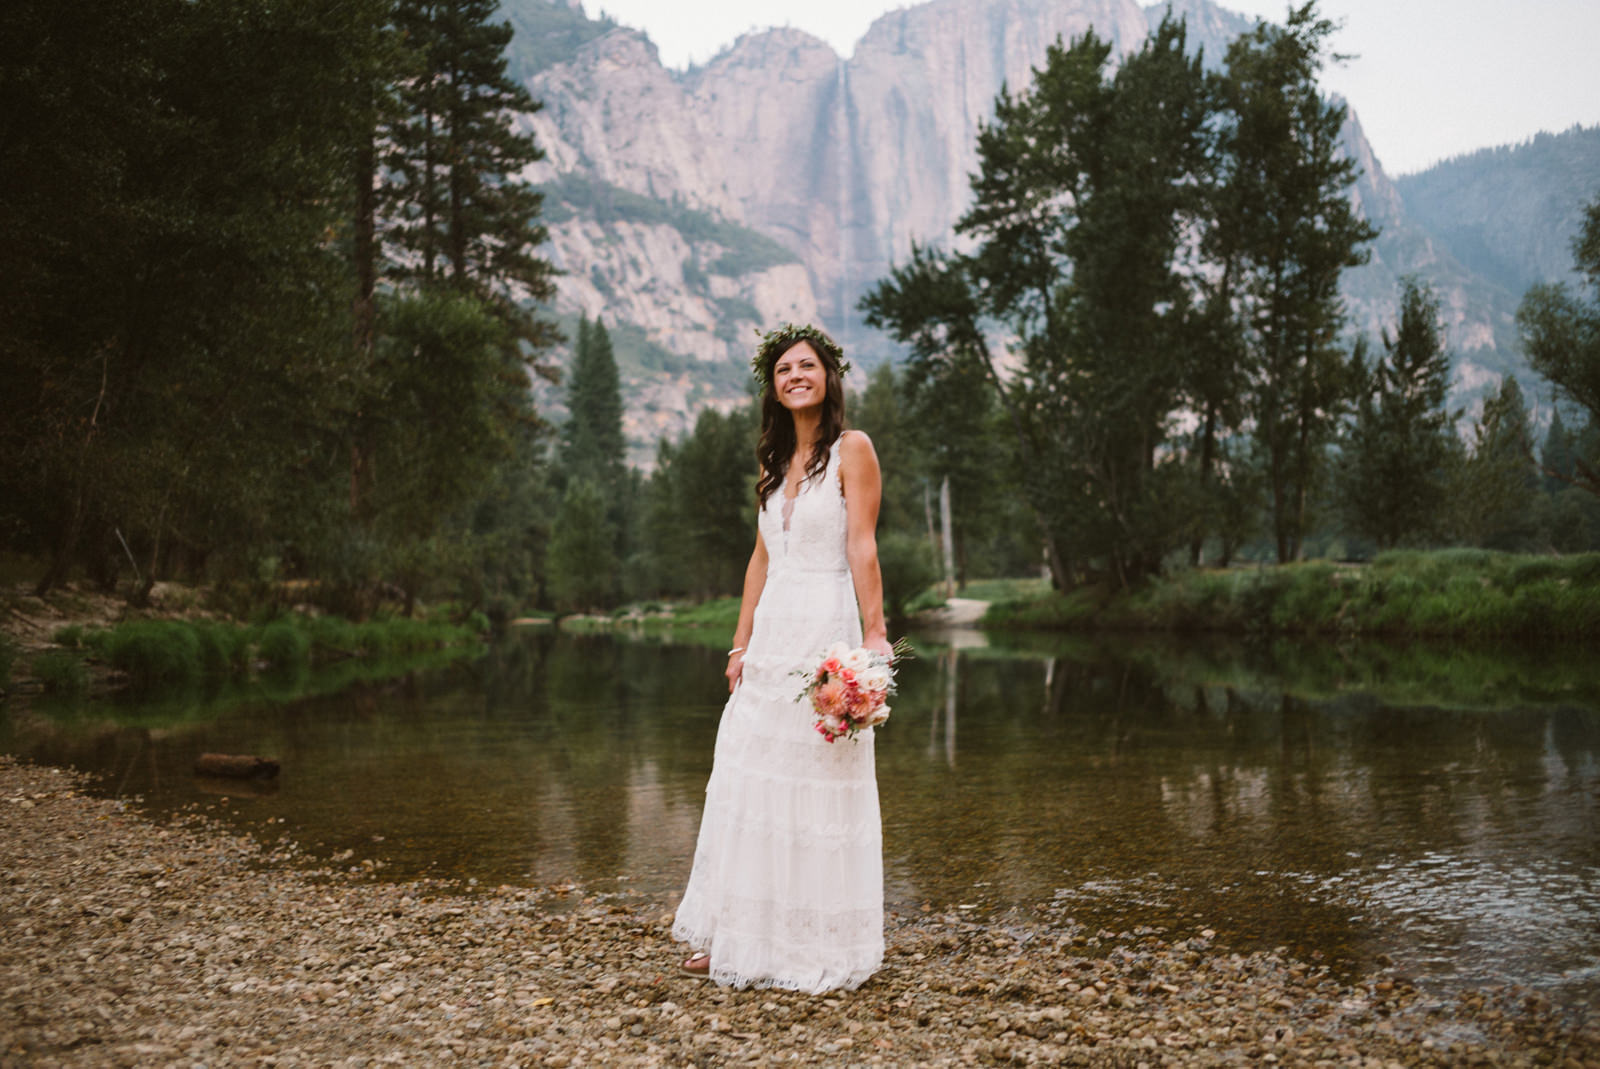 yosemite-intimate-wedding-108 YOSEMITE INTIMATE WEDDING